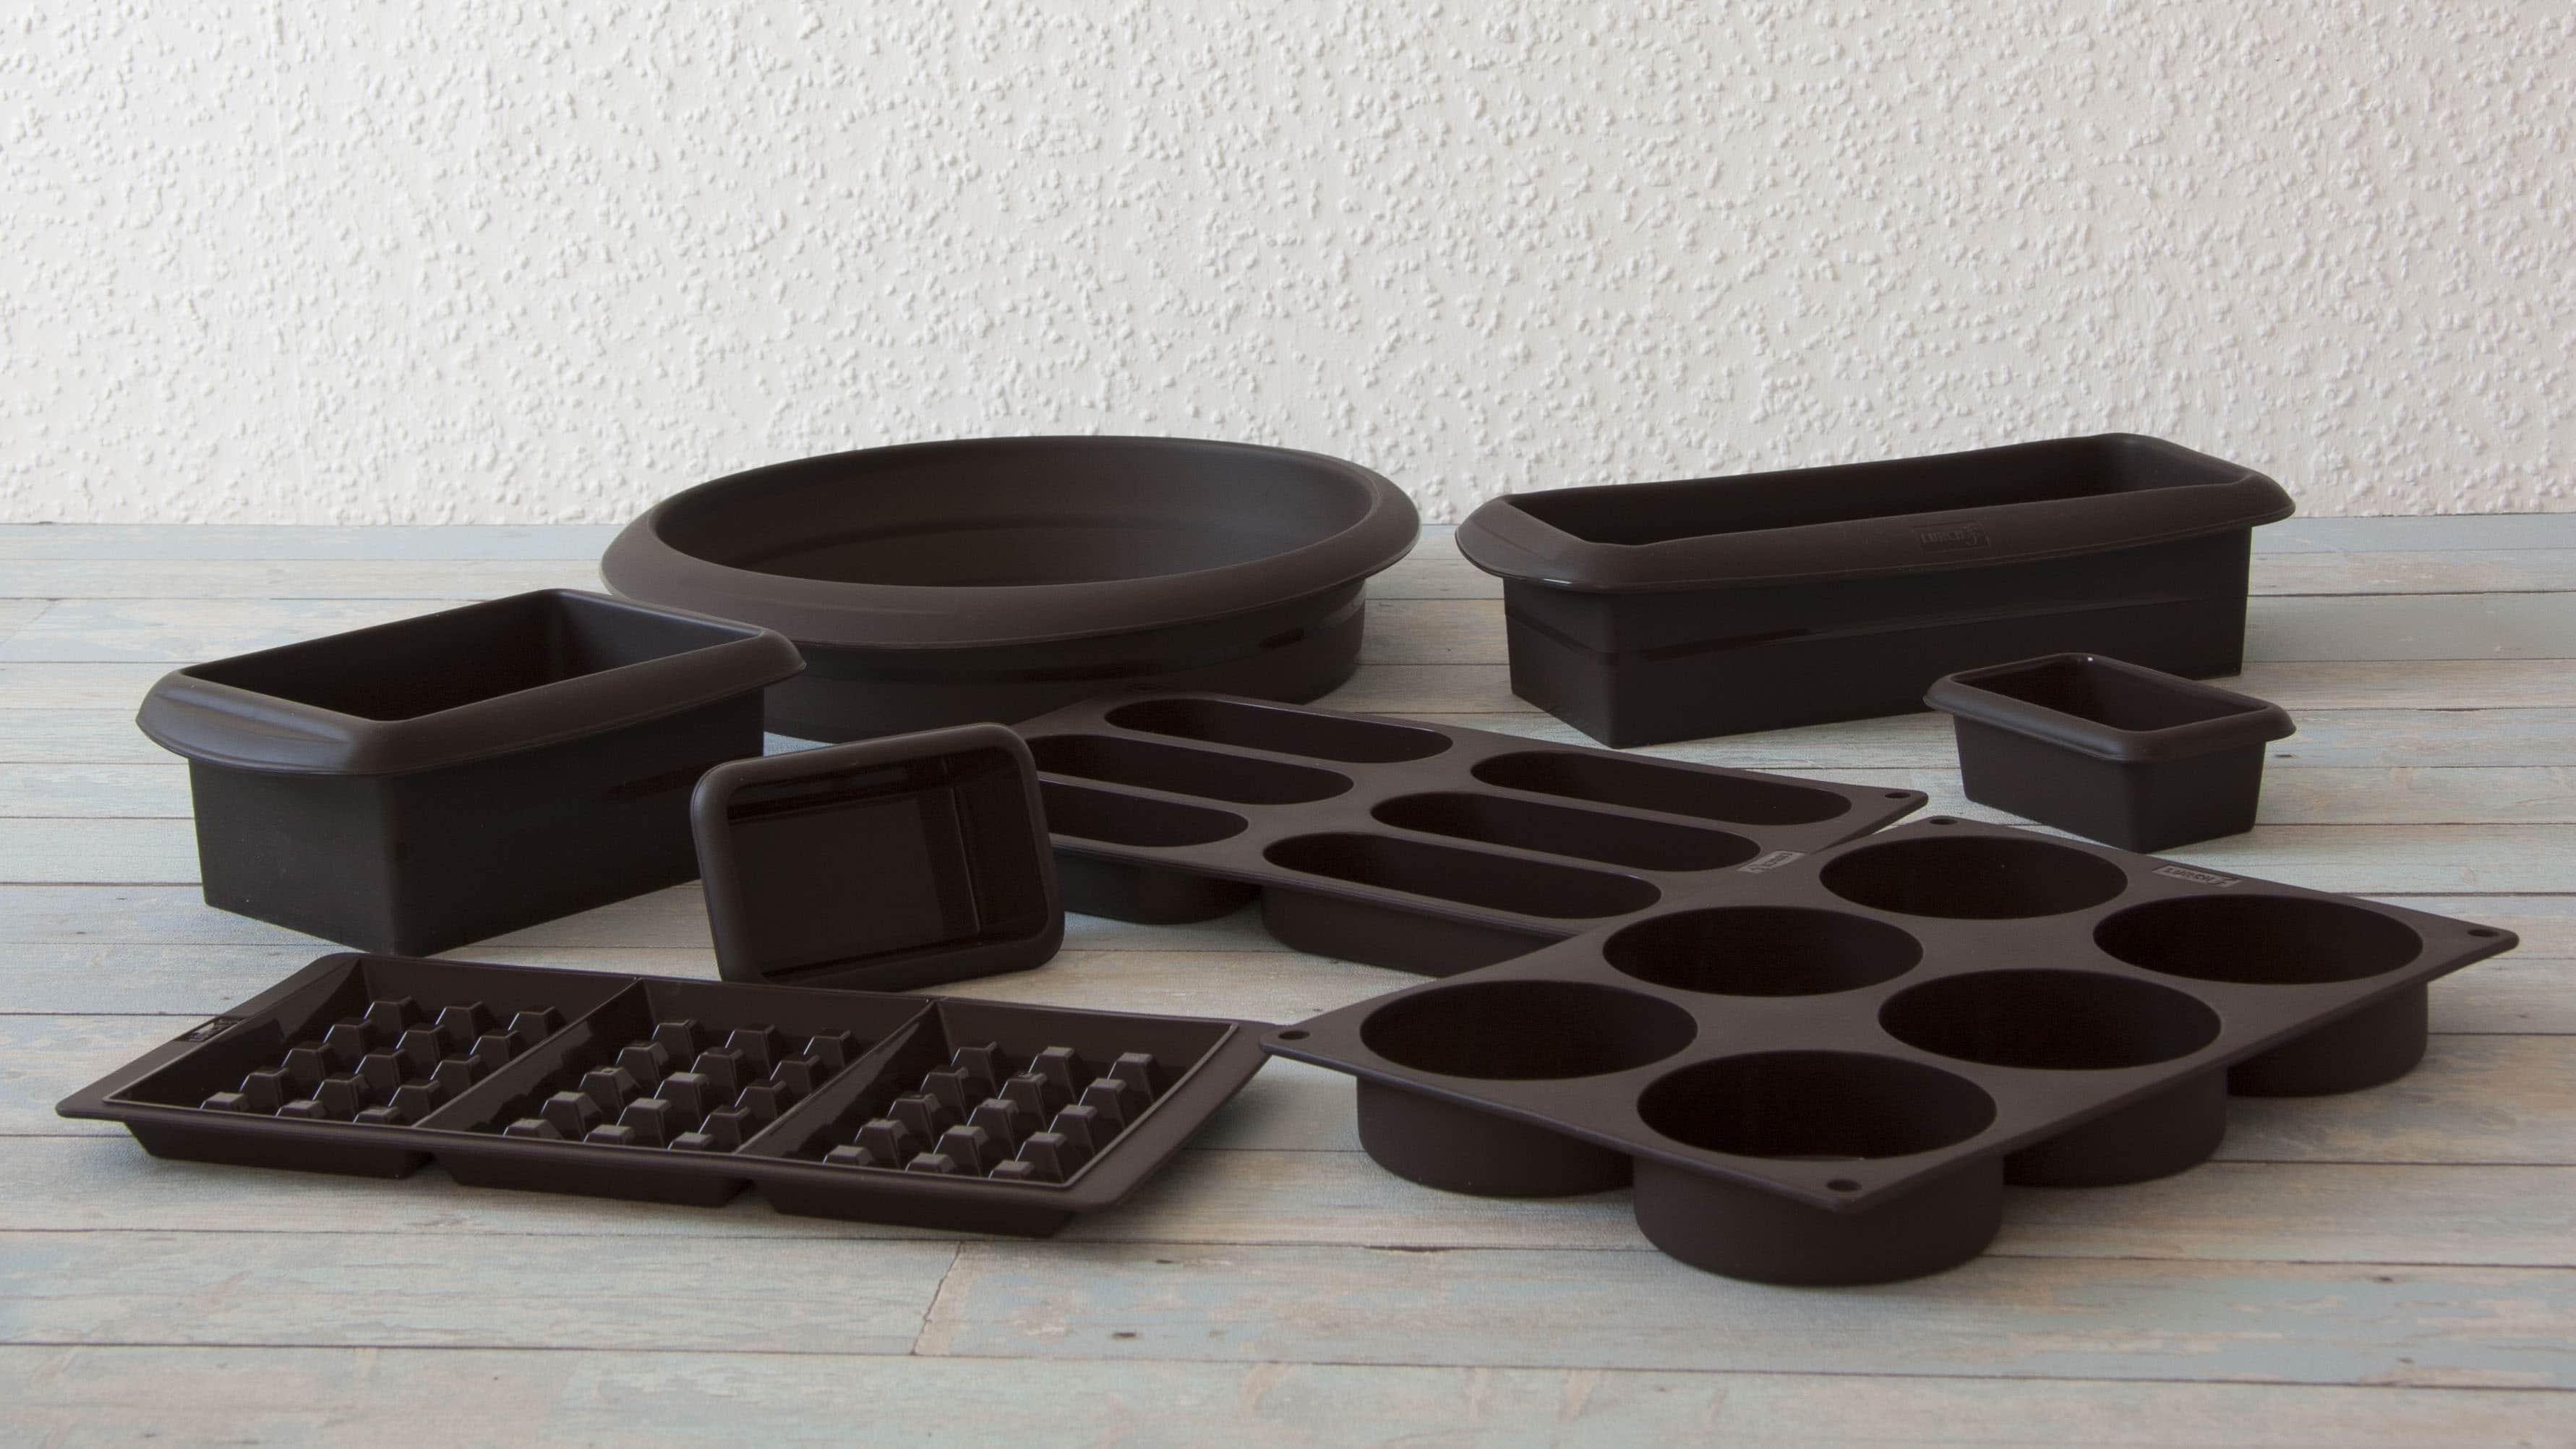 lurch original flexiformen aus silikon carl tode g ttingen. Black Bedroom Furniture Sets. Home Design Ideas